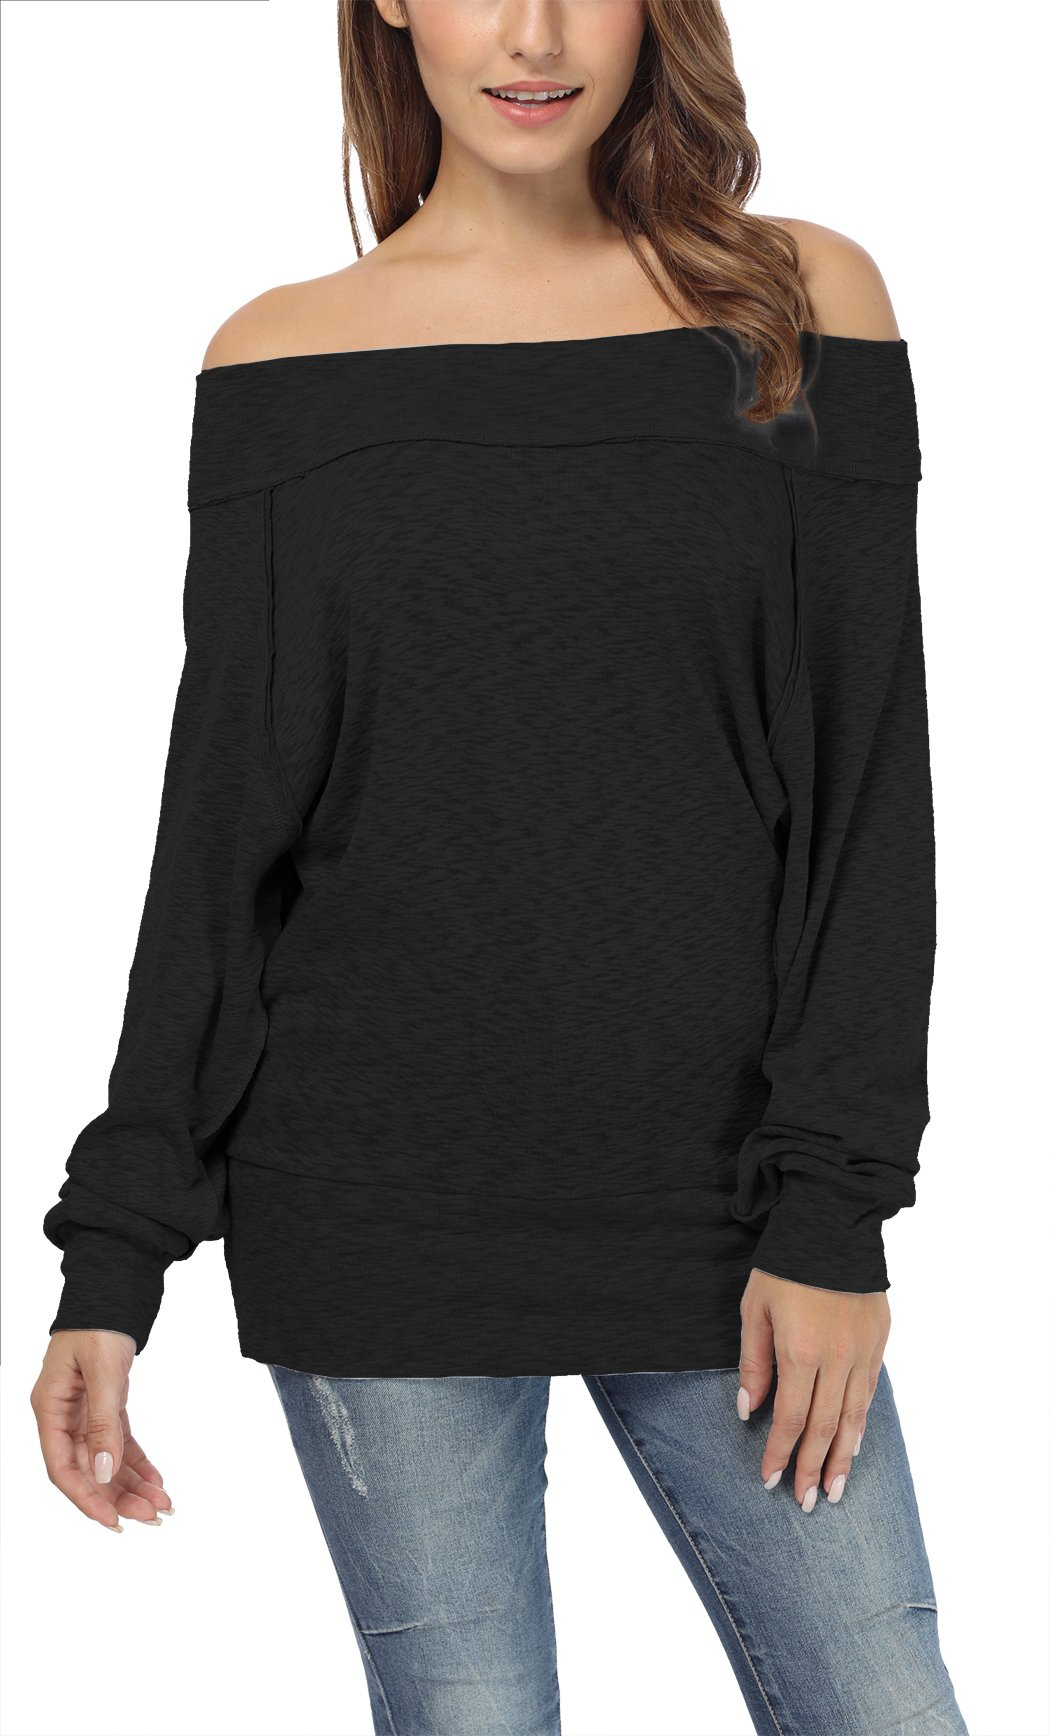 iGENJUN Women's Dolman Sleeve Off The Shoulder Sweater Shirt Tops,Black,M by iGENJUN (Image #3)